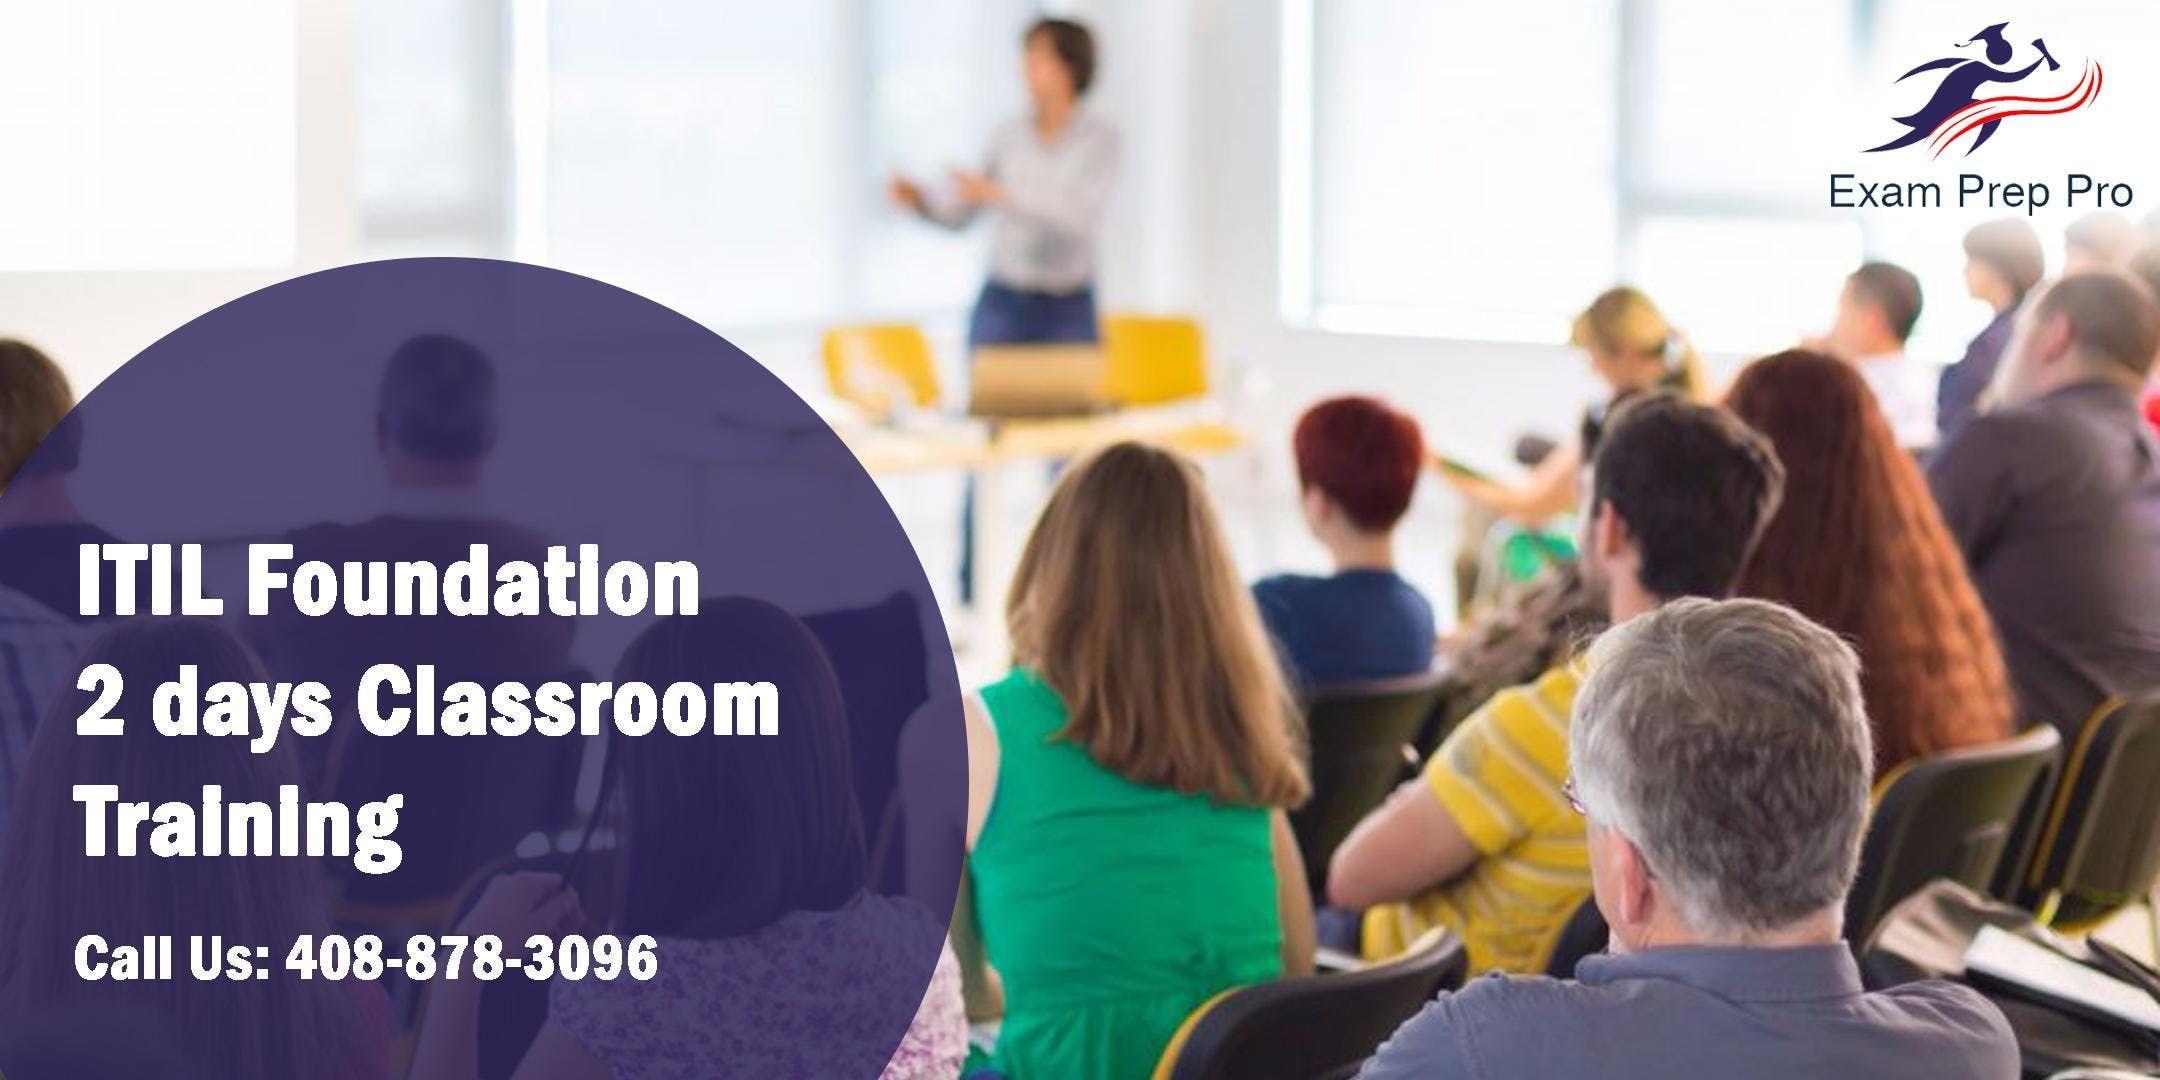 ITIL Foundation- 2 days Classroom Training in ColumbiaSC